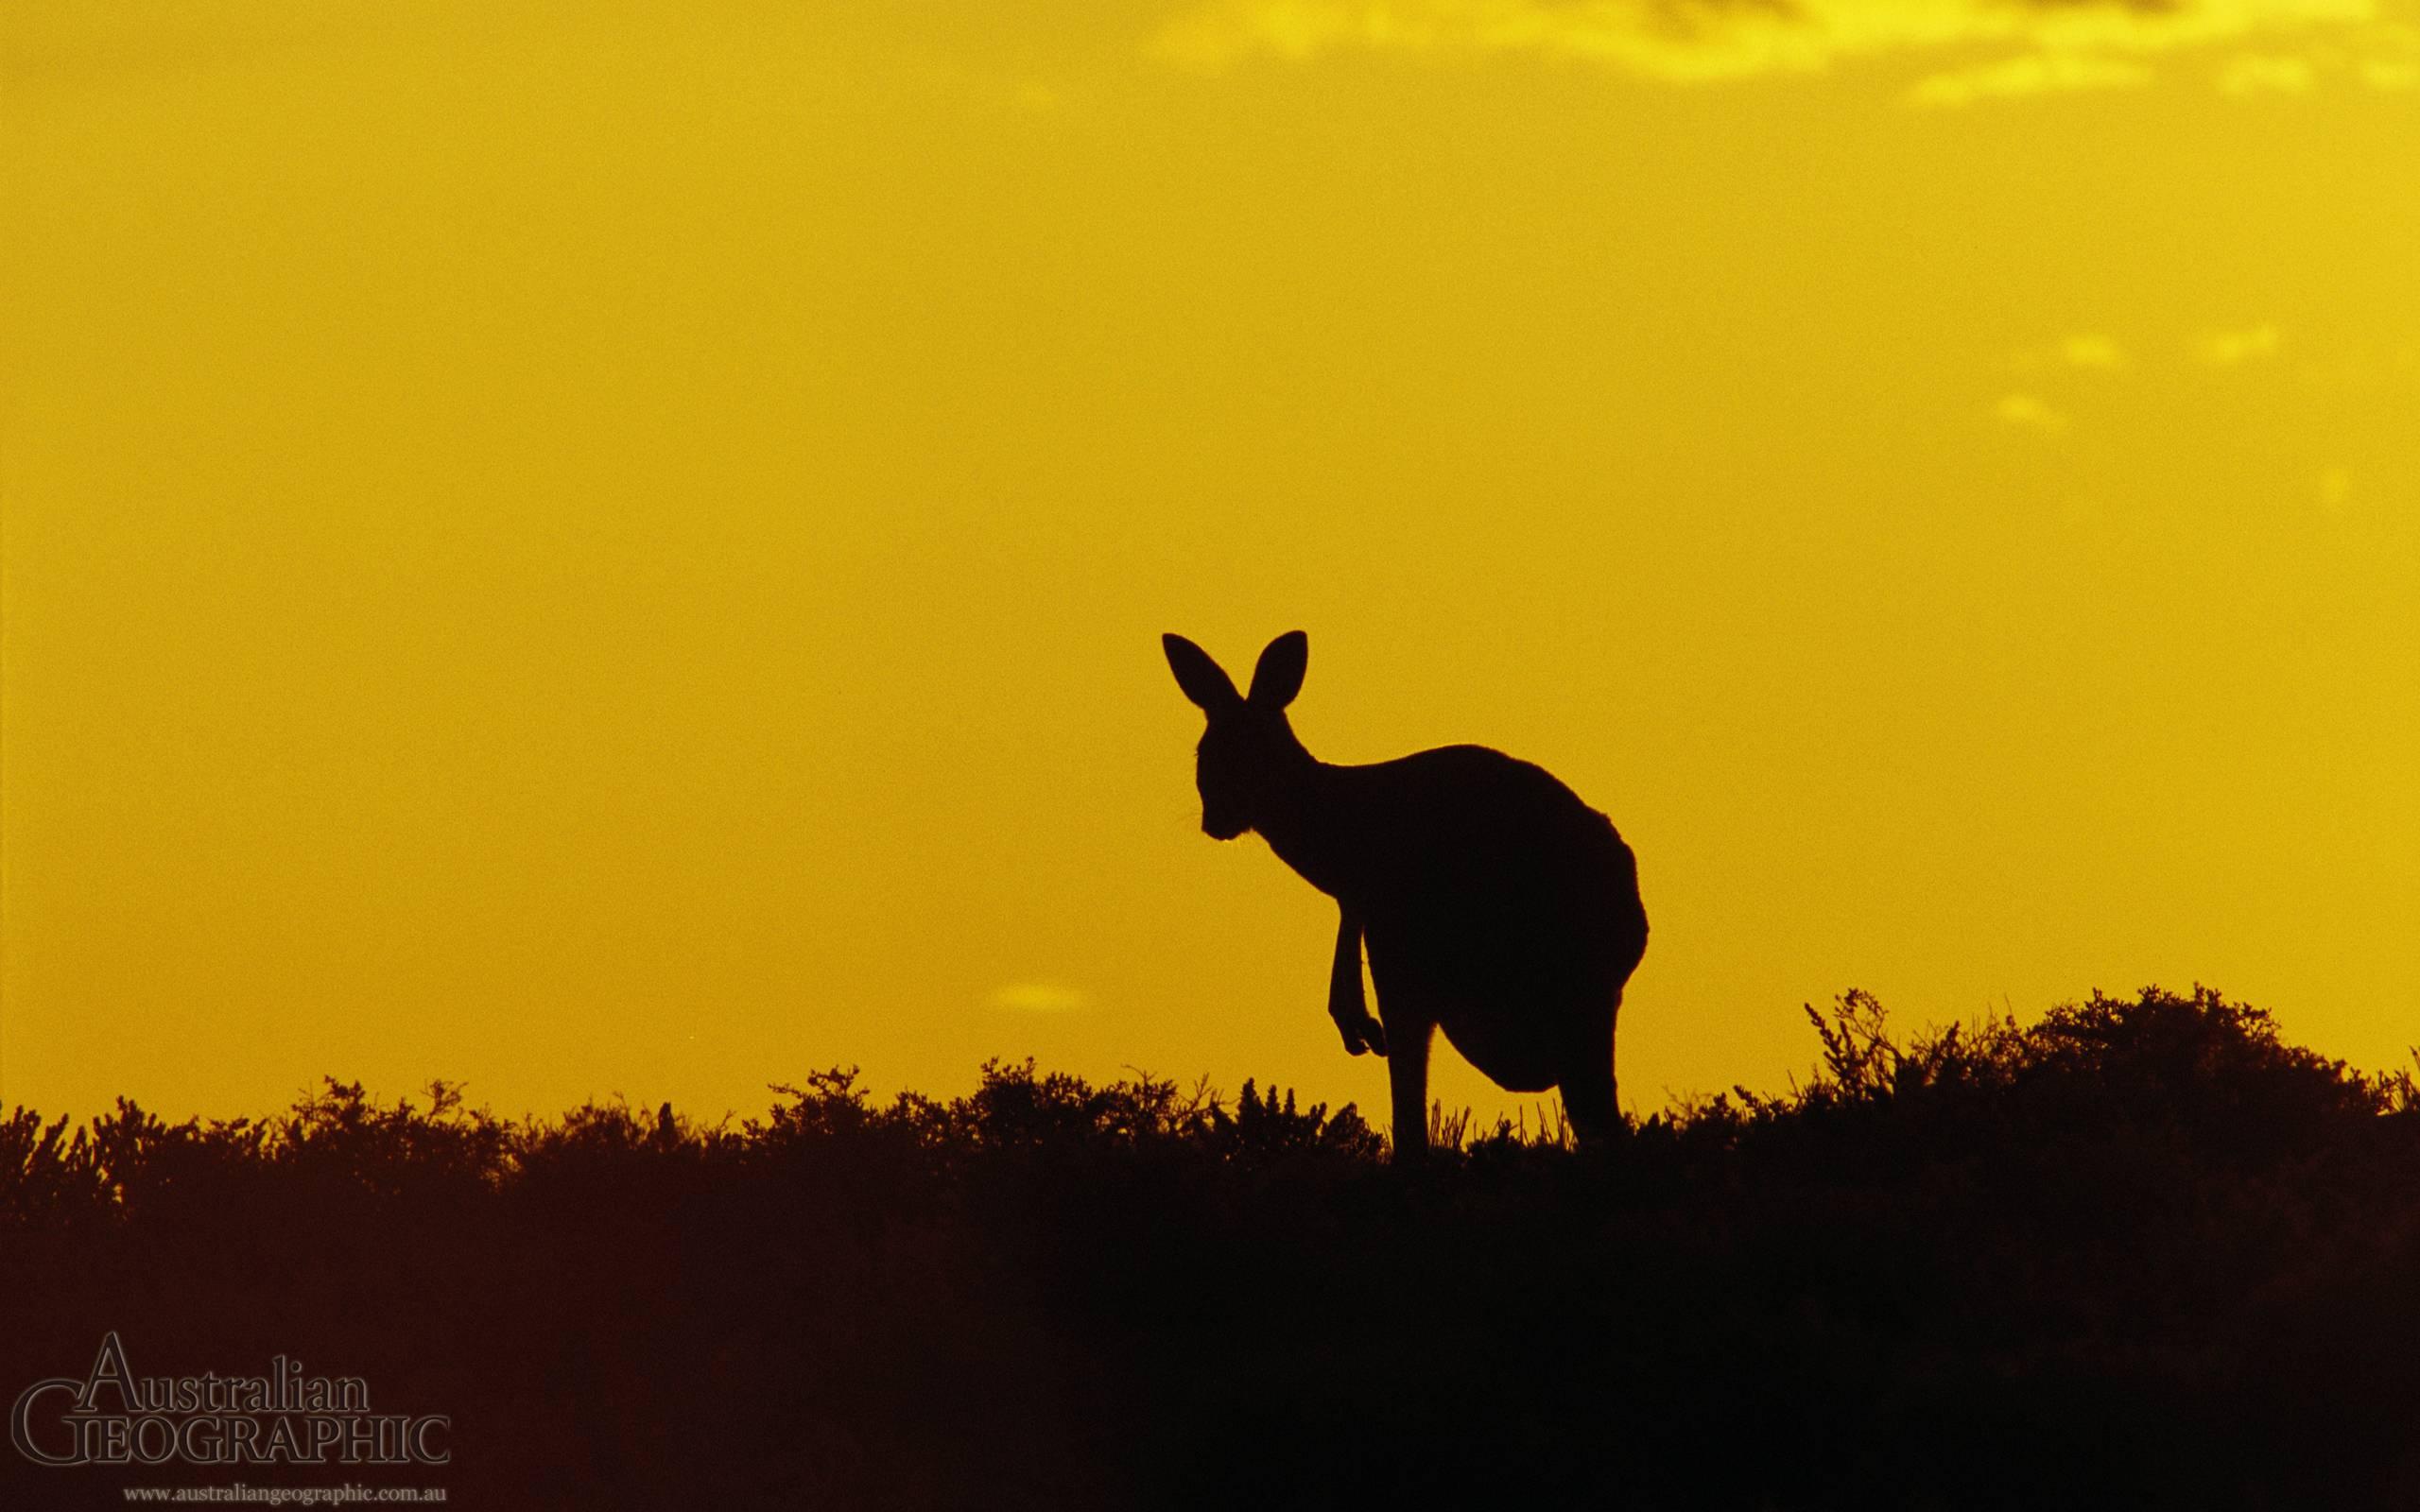 Kangaroo Sturt National Park New South Wales The (id: 186347 ...